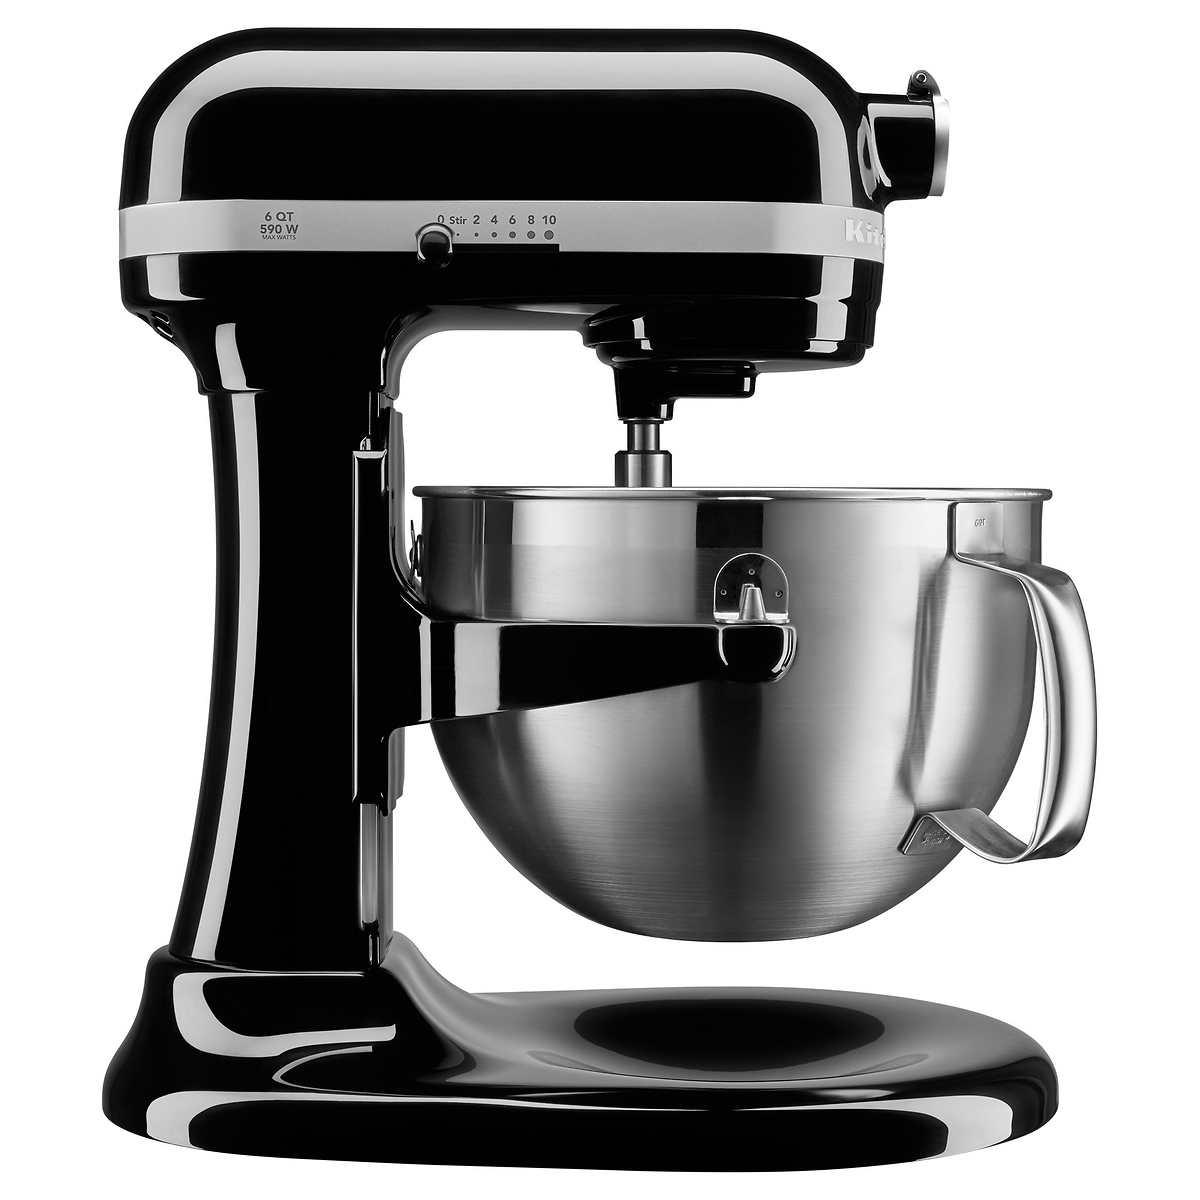 Kitchenaid Mixer Special Offer kitchenaid 6-quart professional bowl-lift stand mixer